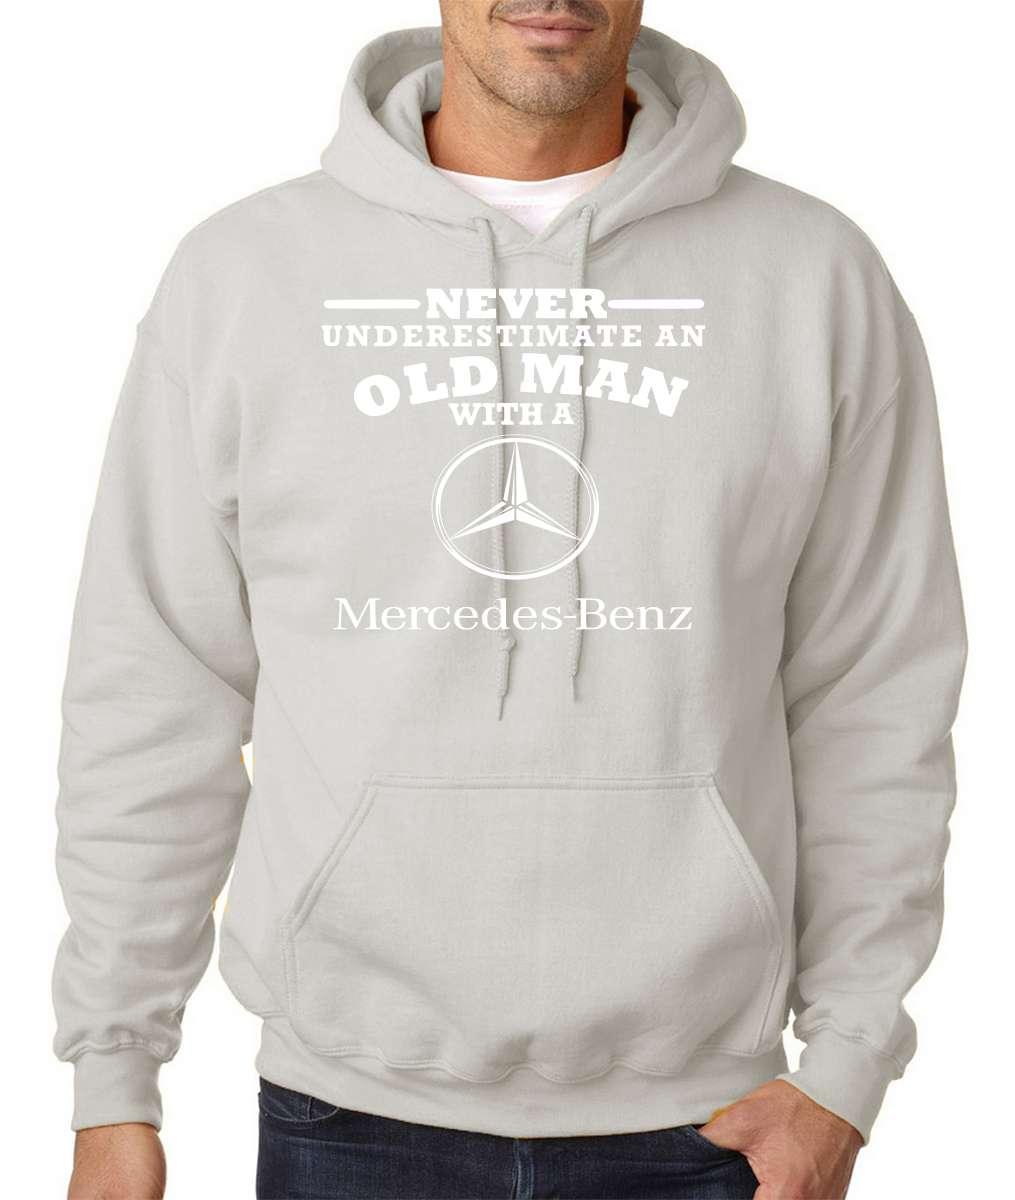 Mercedes benz never underestimate an old man mens hoodies for Mercedes benz hoodie